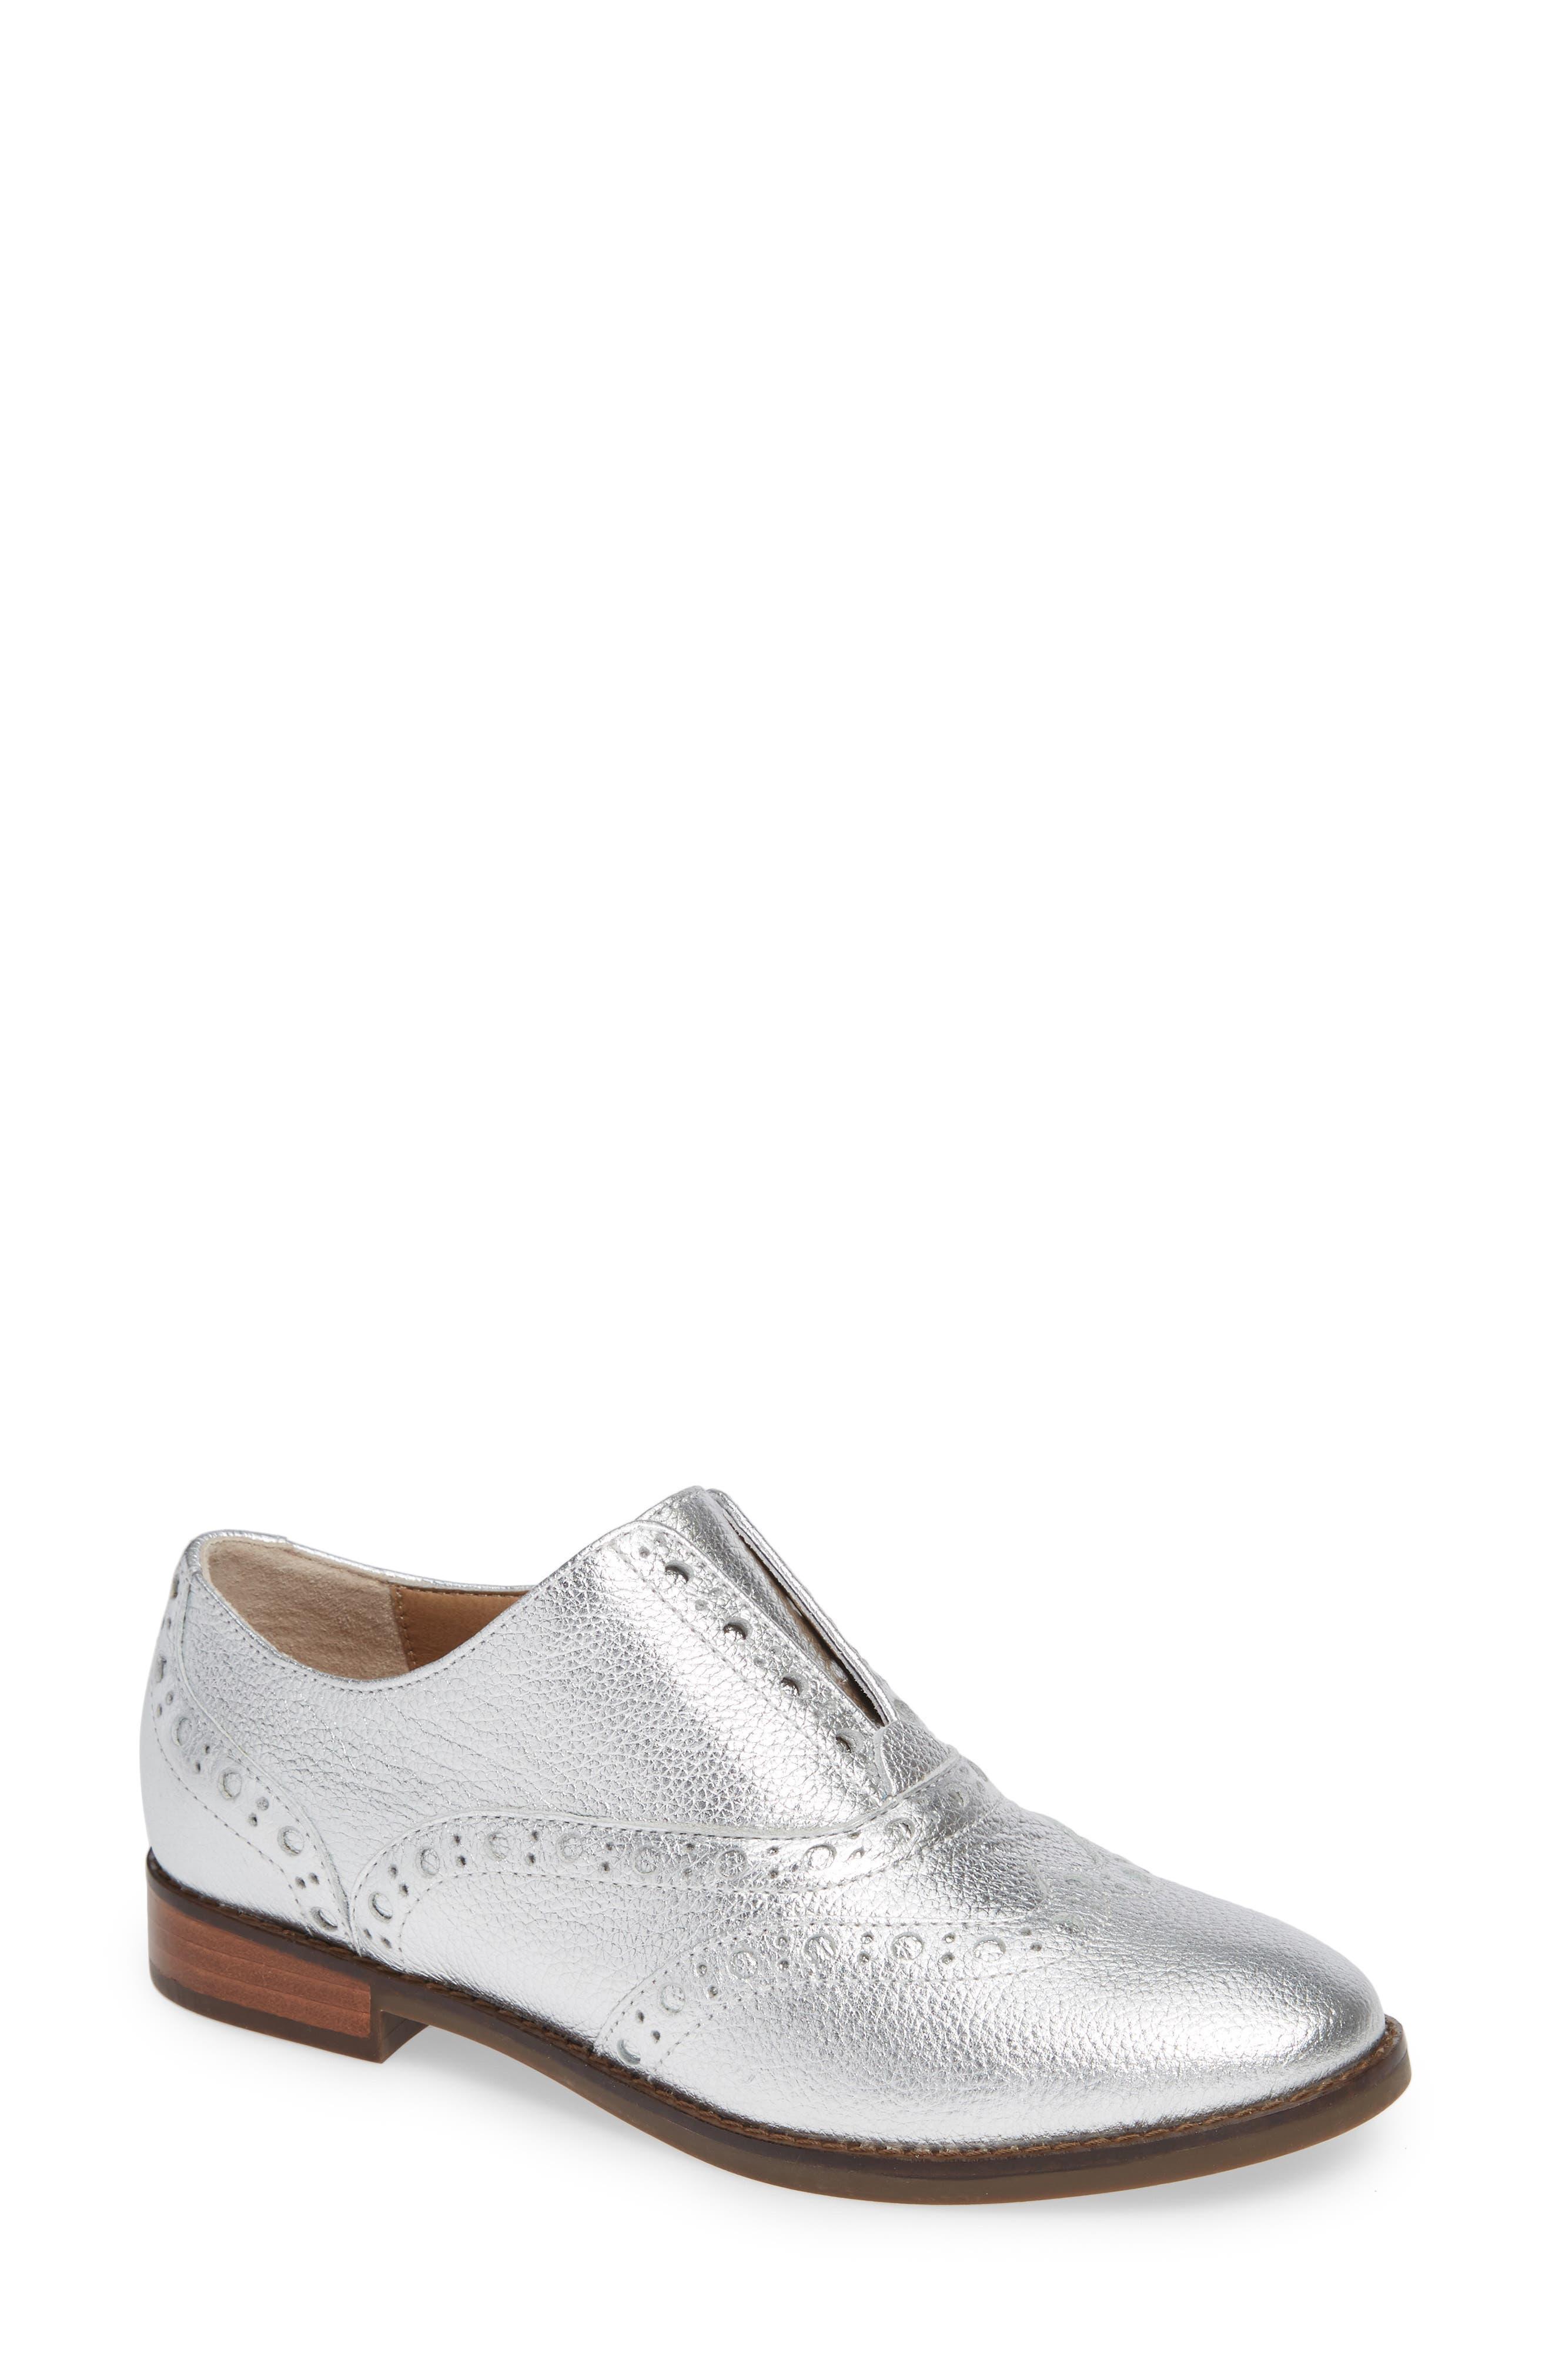 Hadley Wingtip,                         Main,                         color, Silver Leather